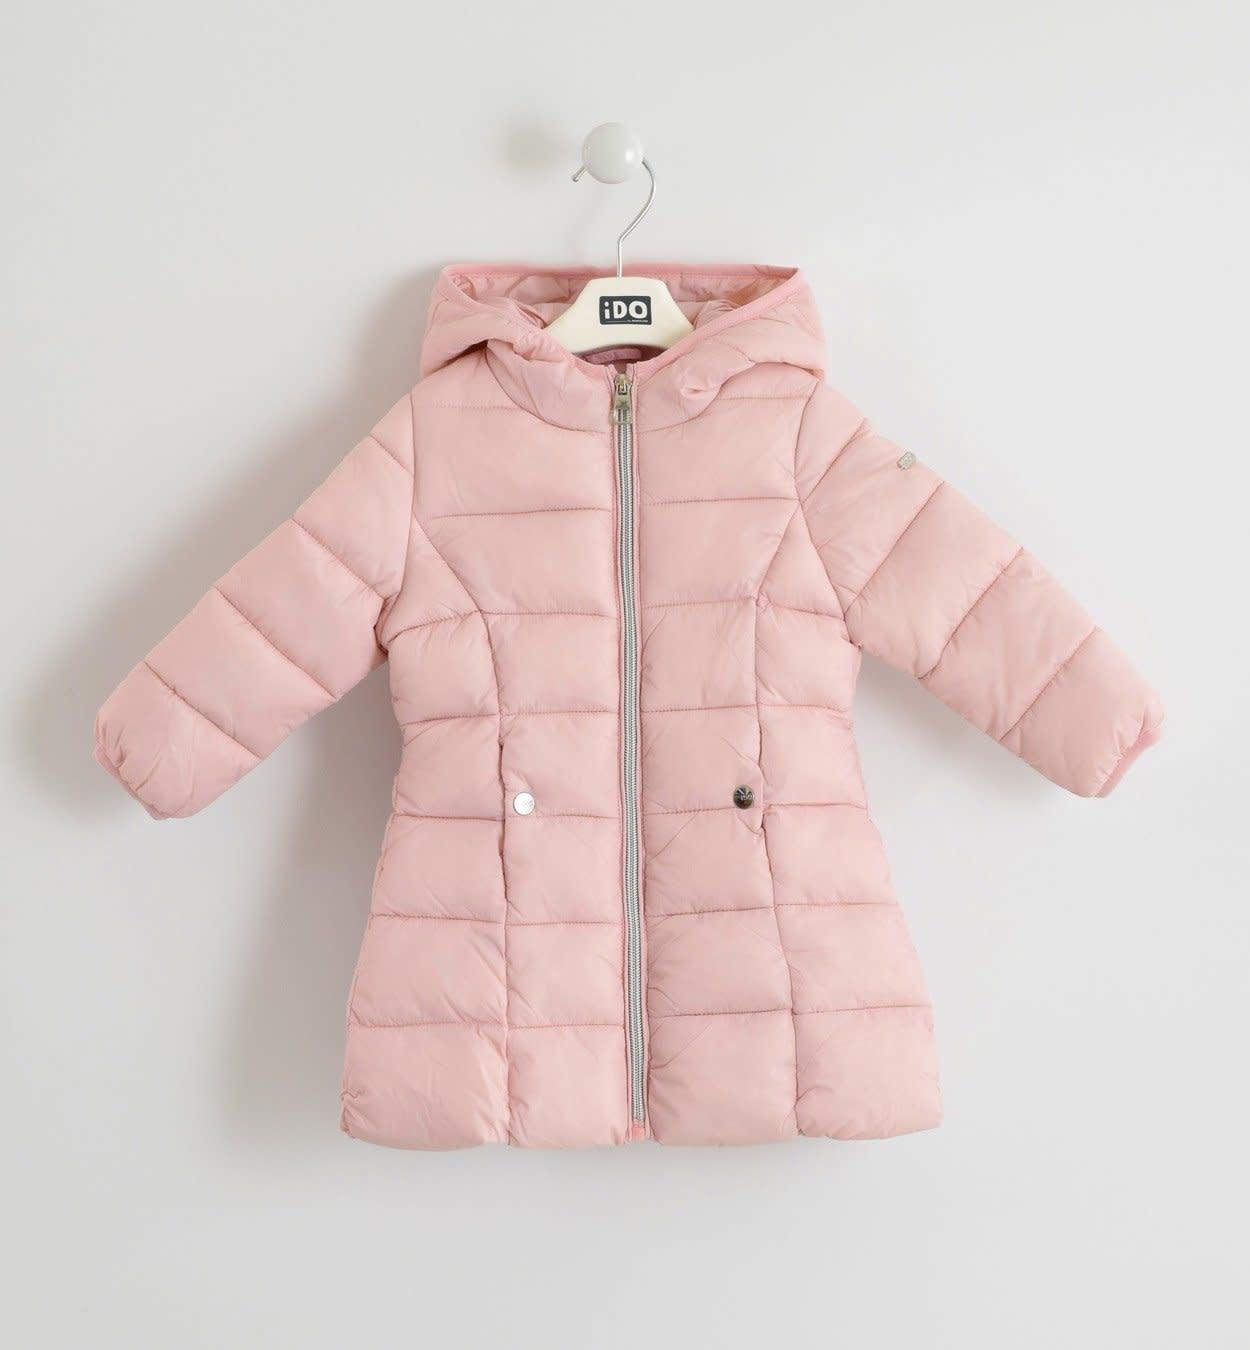 Ido IDo K693 Pink Thermal Padded Jacket